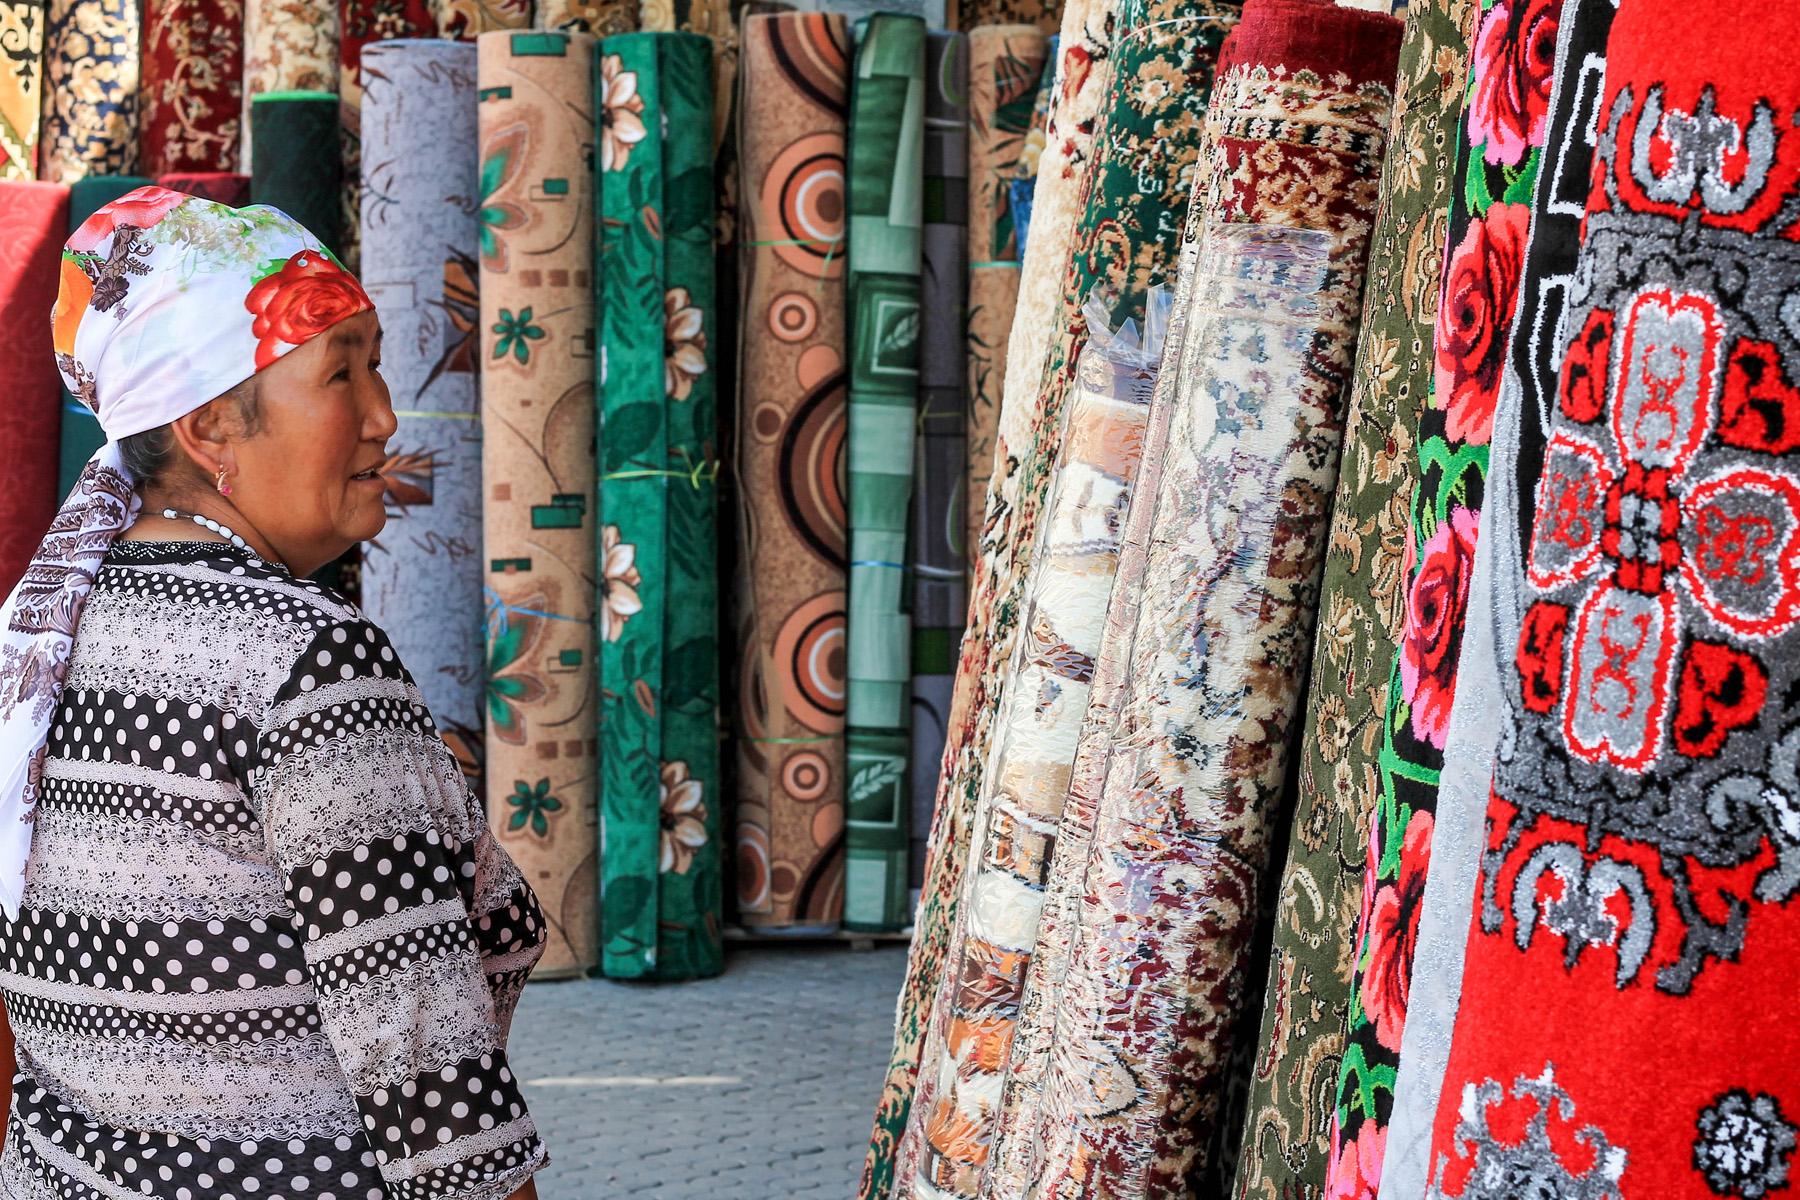 Na bazarze w Dżalalabad